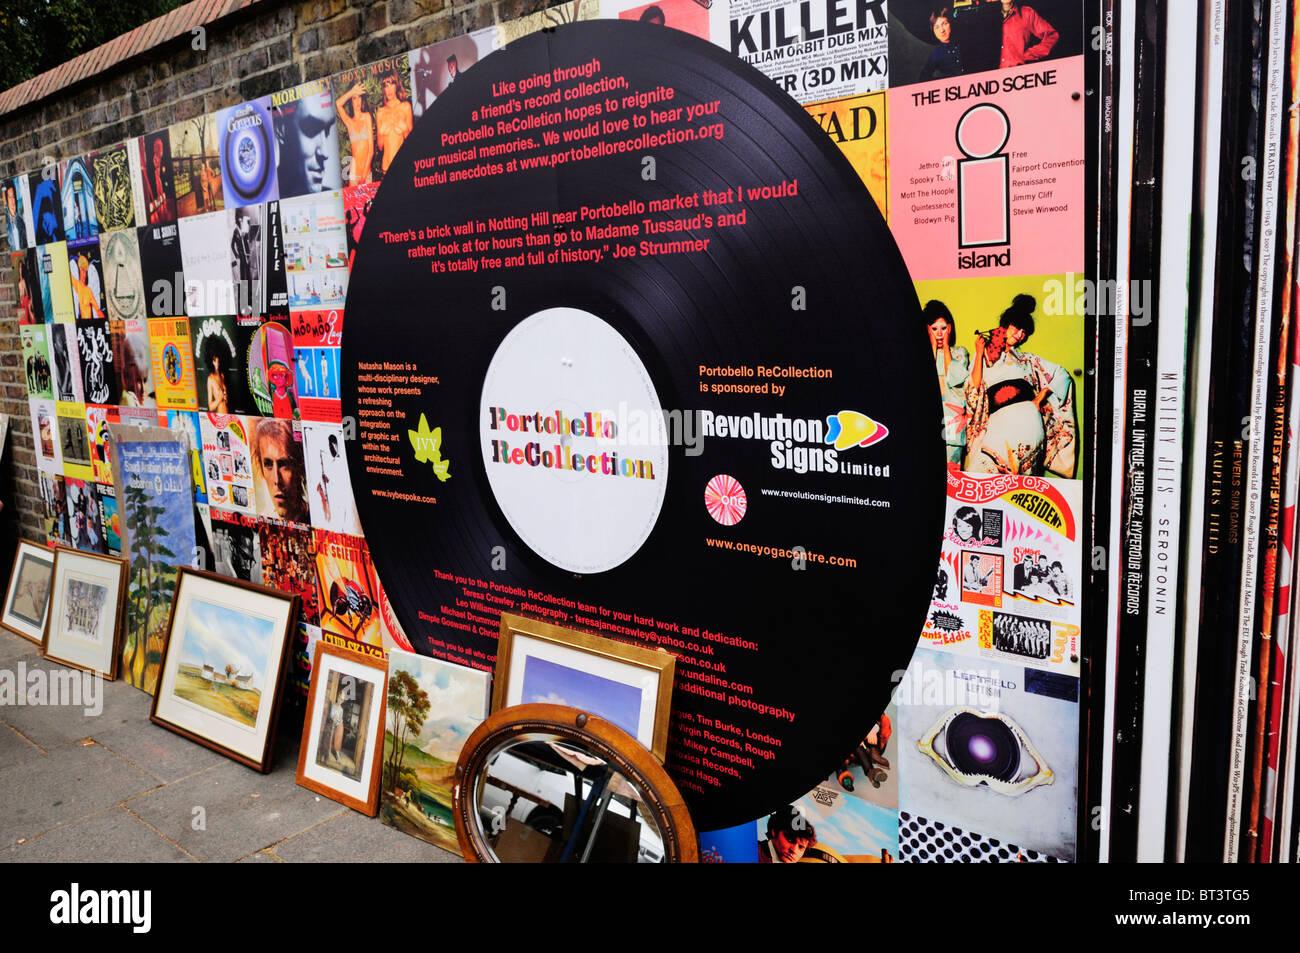 Portobello ReCollection wall decorated as Vinyl Record Album Covers, Portobello Road, Notting Hill, London, England, - Stock Image